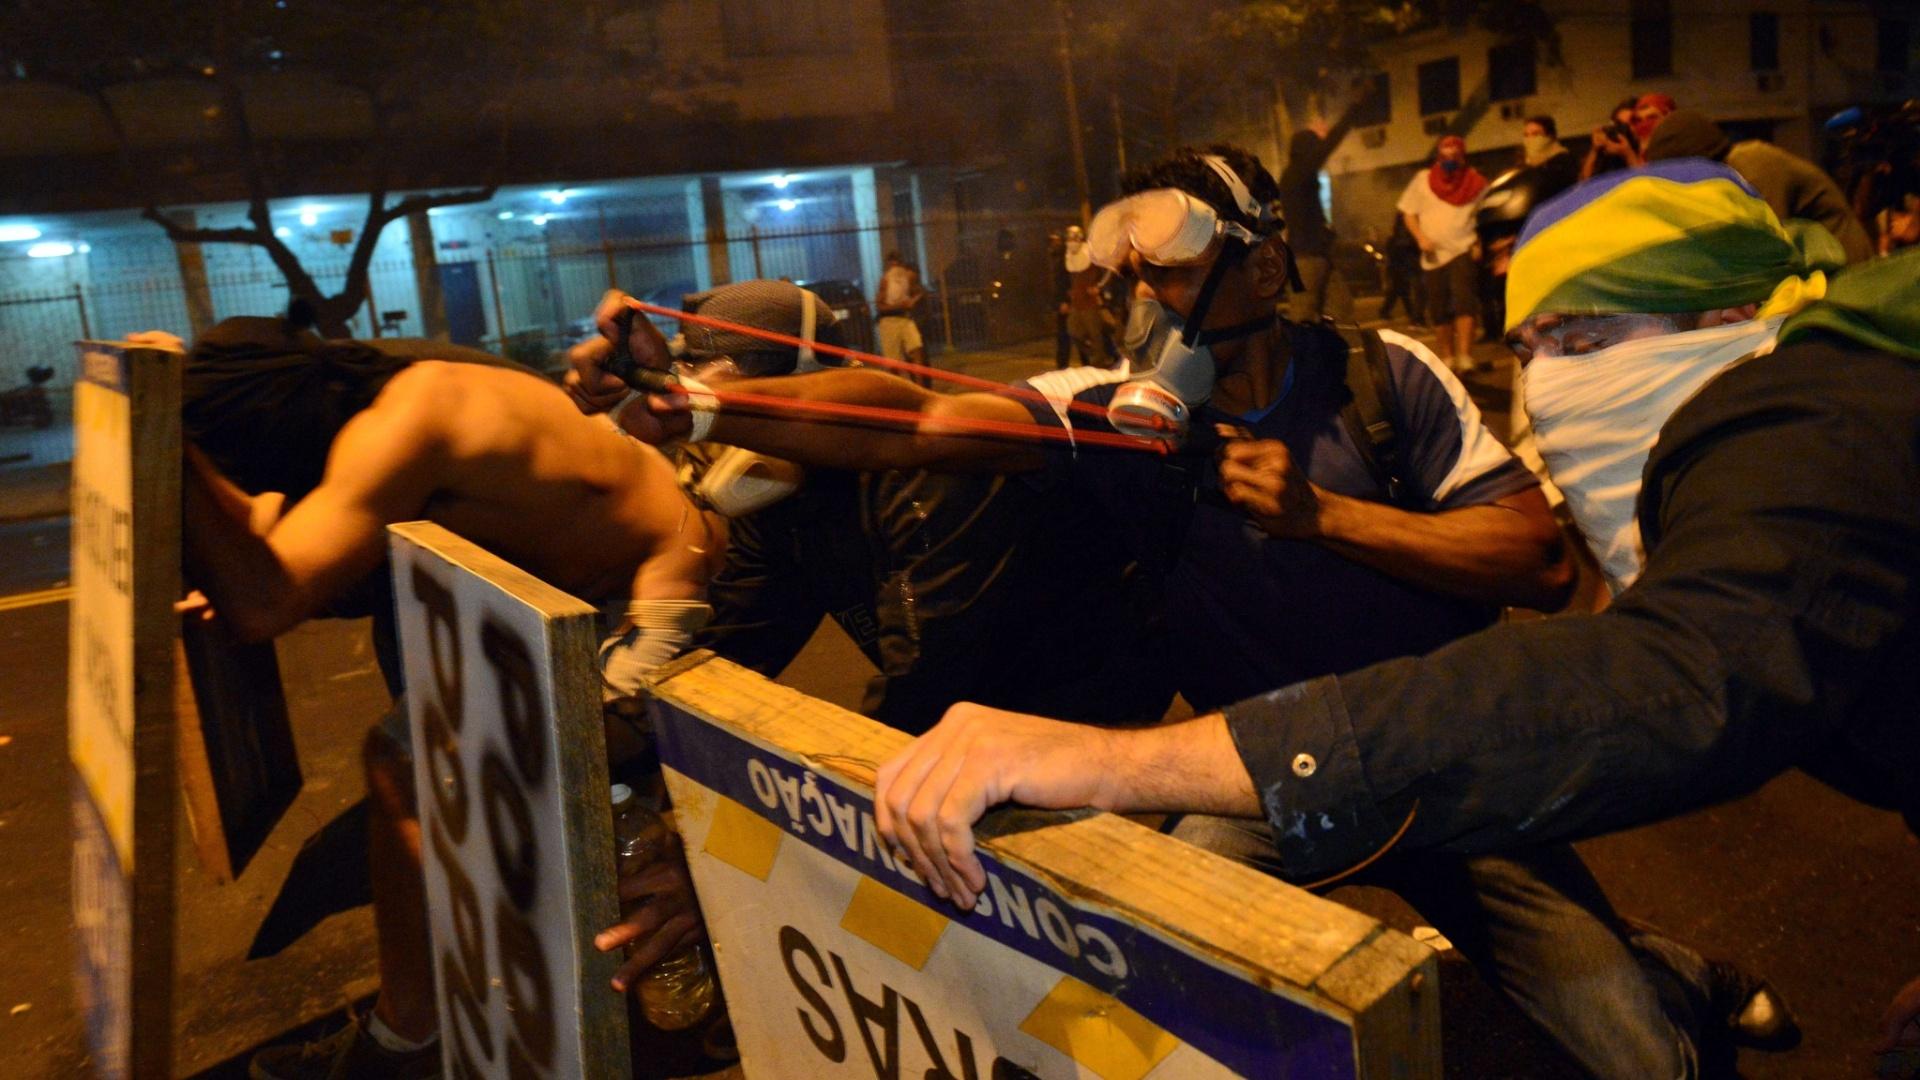 30.jun.2013 - Manifestante se esconde atrás de placas e usa estilingue para atirar contra a polícia durante protesto